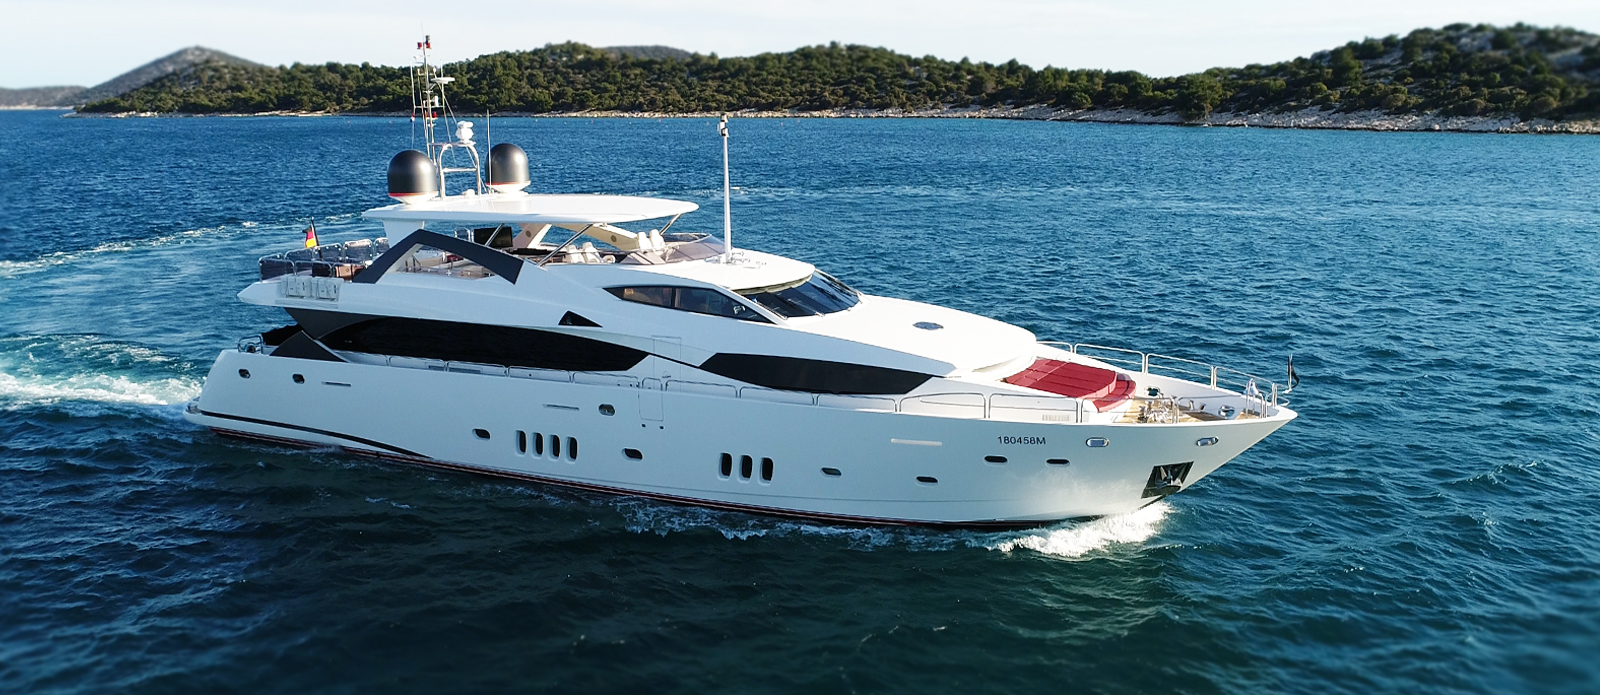 Sunseeker 34M White Pearl at Anchor in Croatia